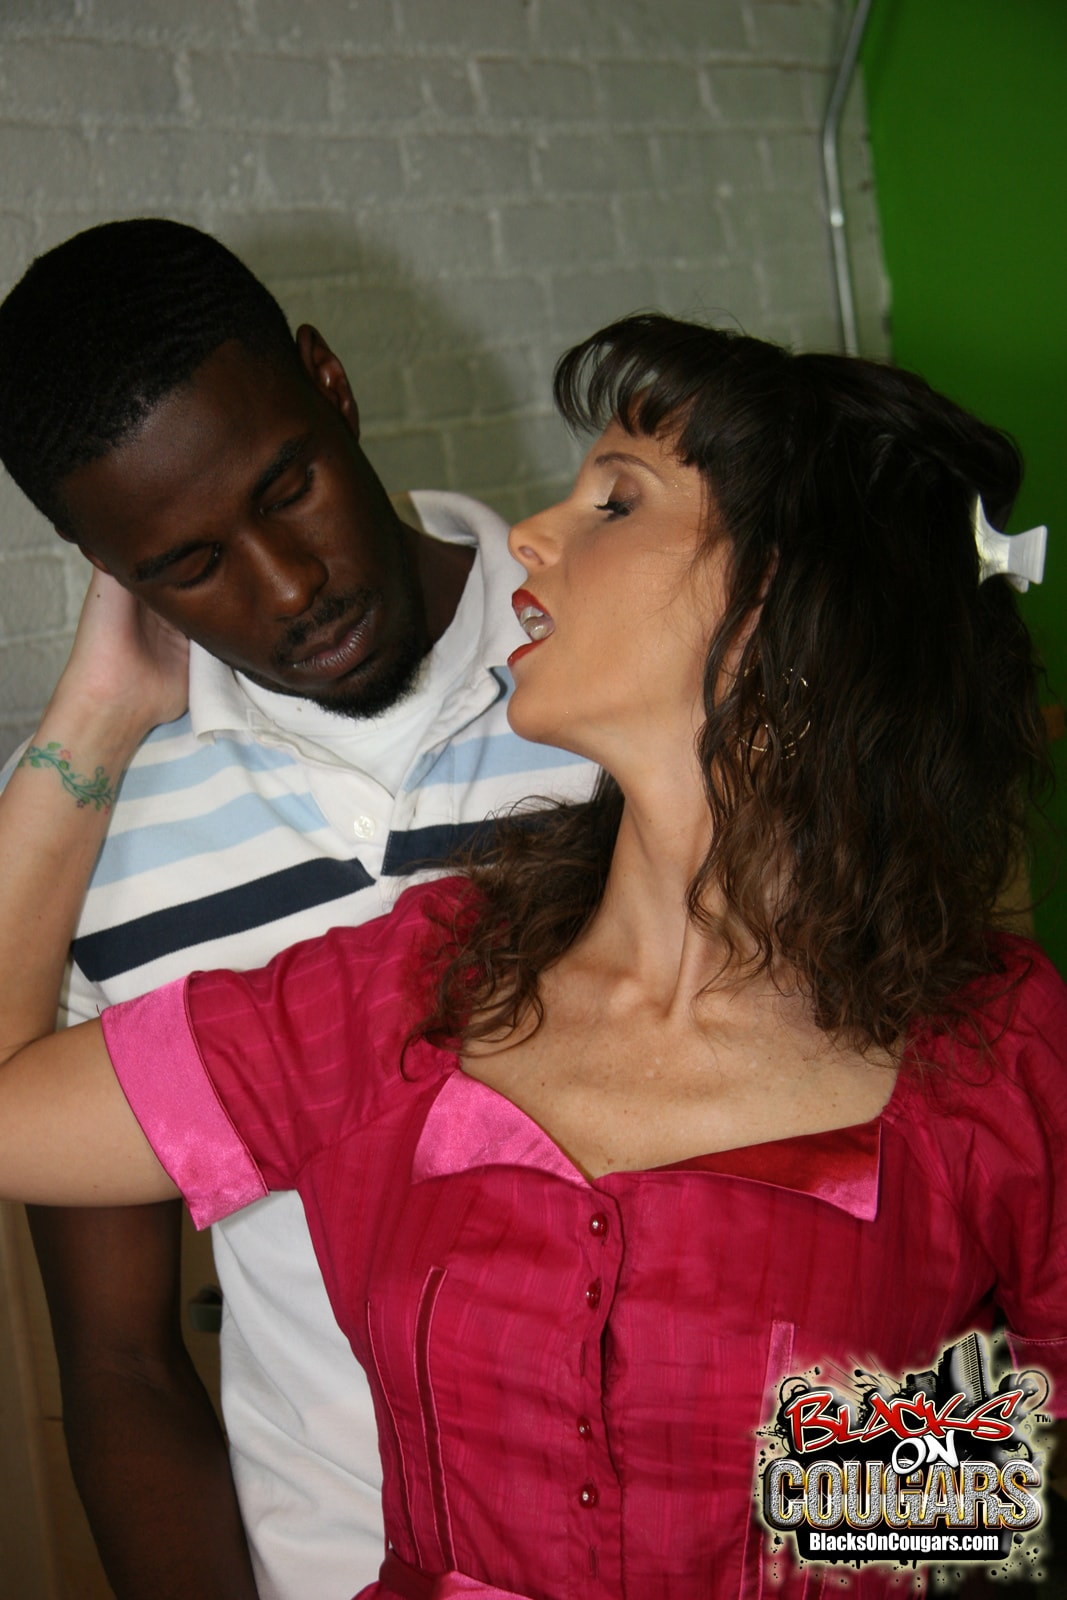 Dogfart '- Blacks On Cougars' starring Syren Demer (Photo 7)